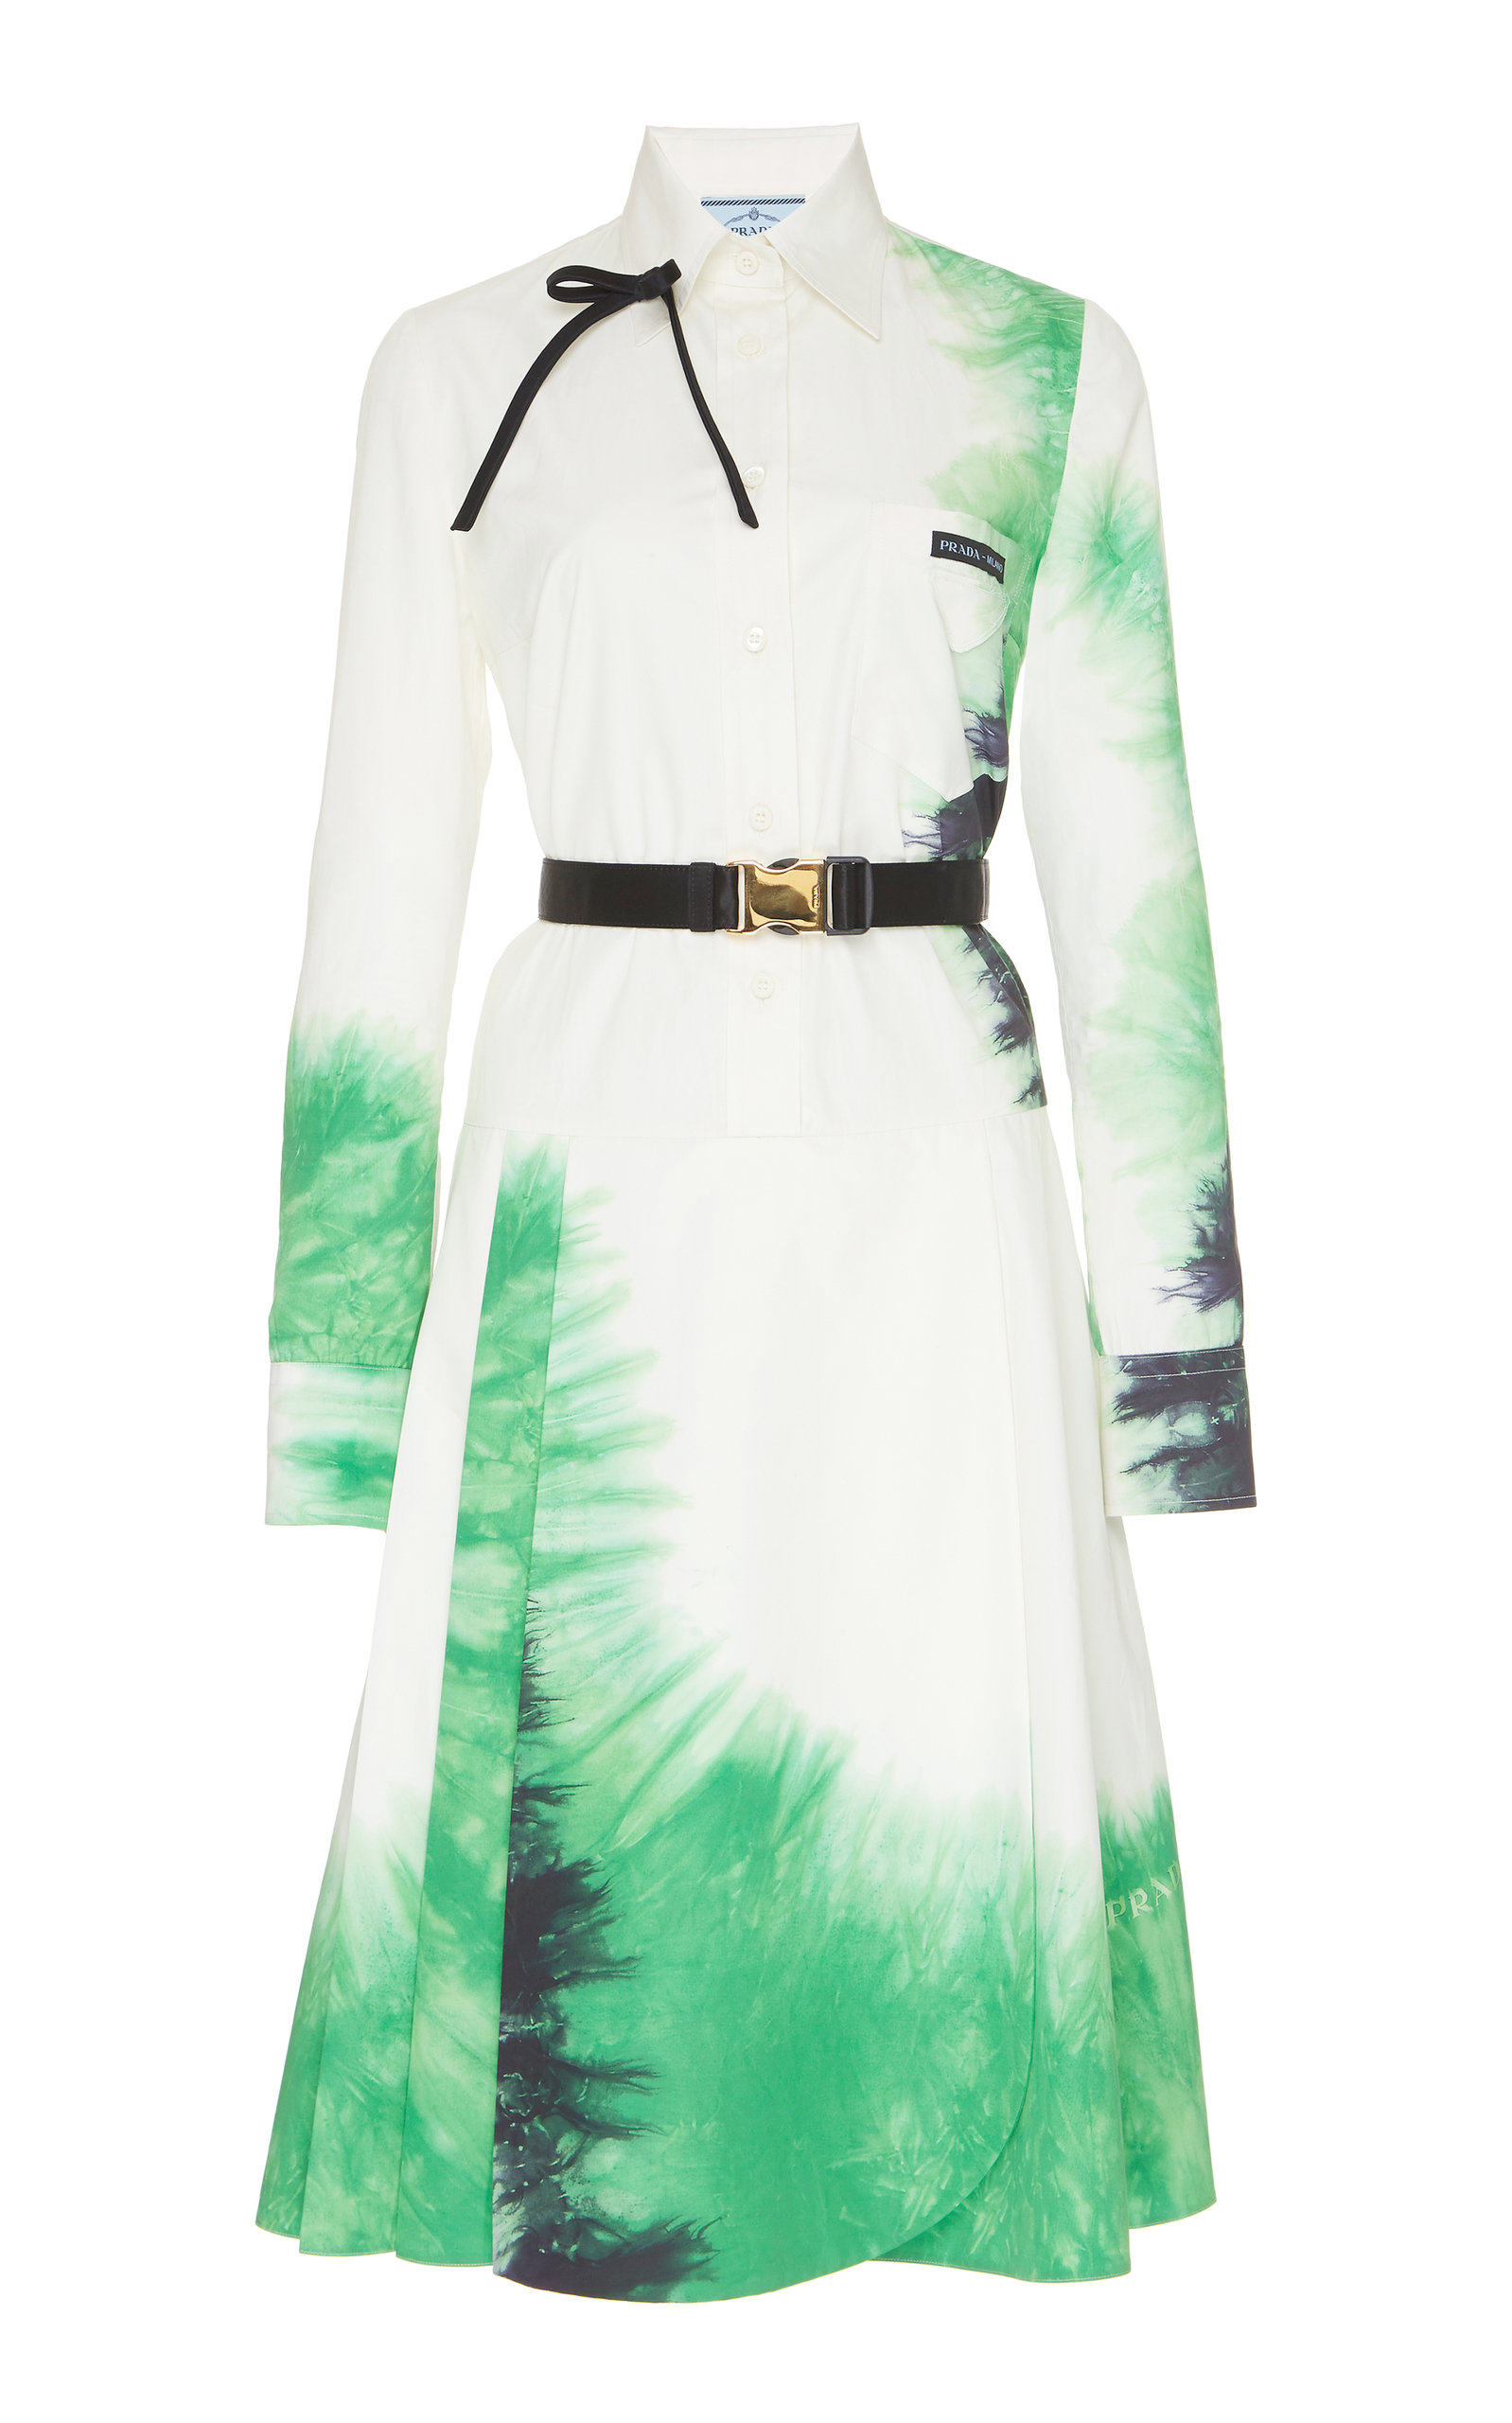 Buy Prada Belted Tie-Dye Poplin Dress online, shop Prada at the best price